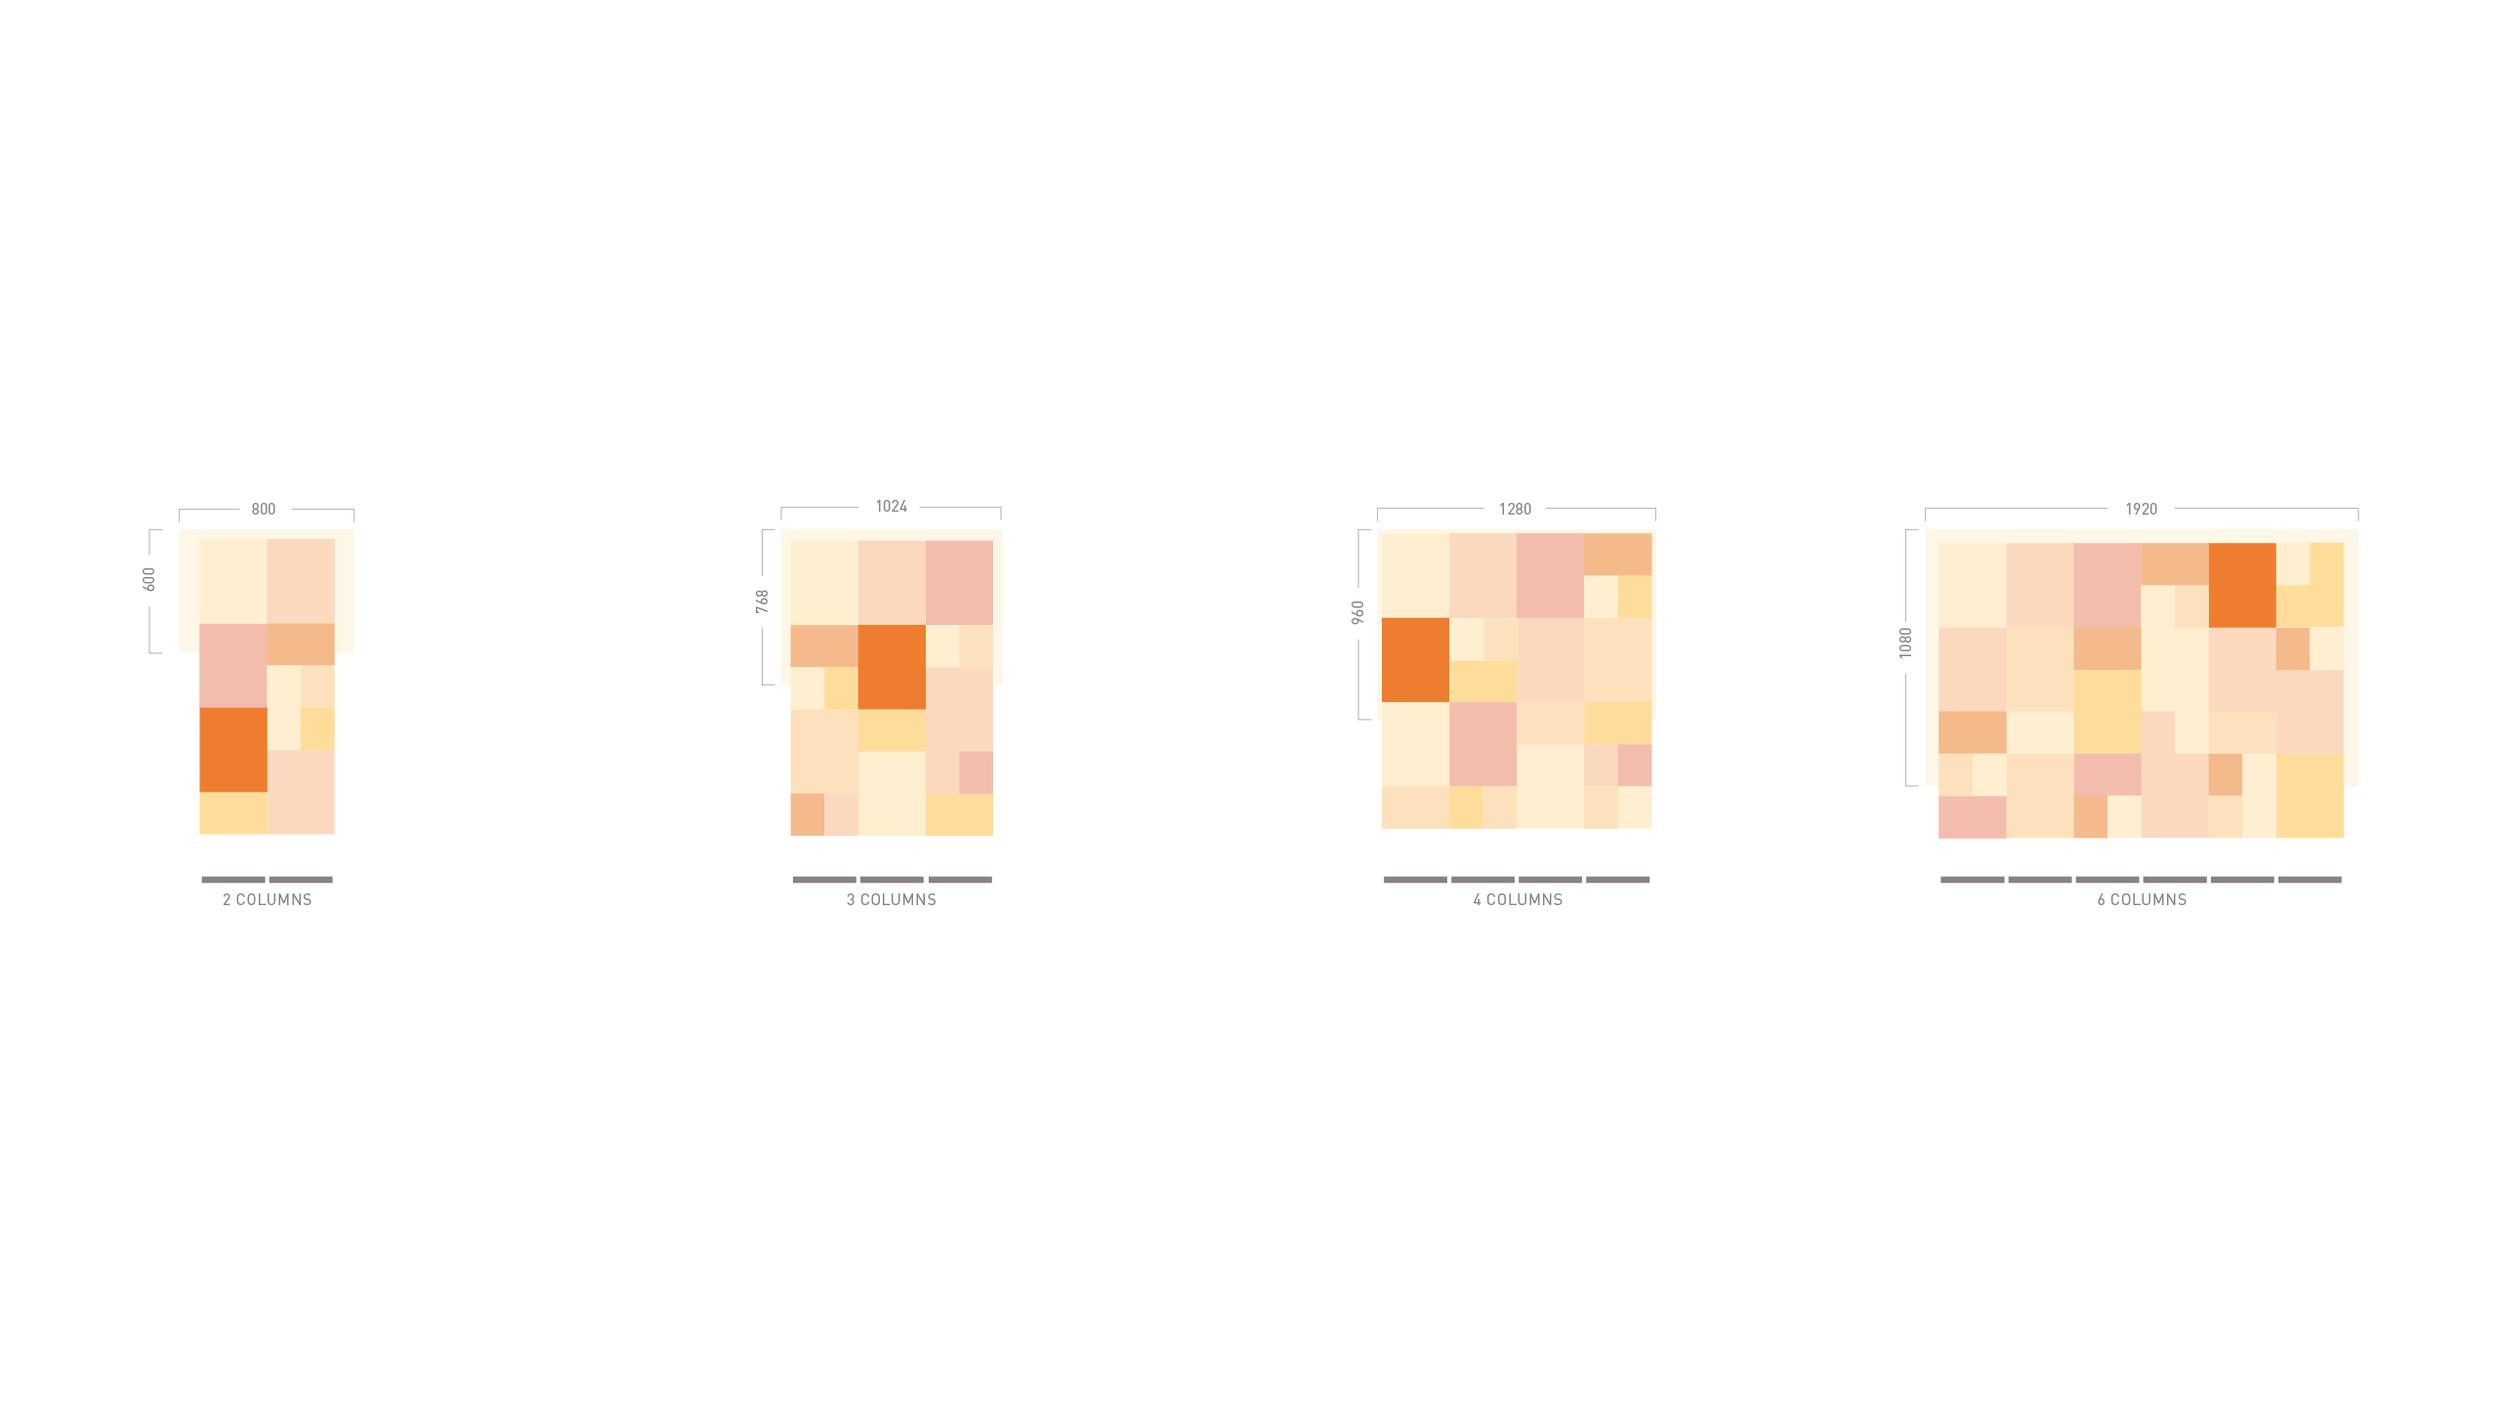 Yoplait_PresentationIllustrations_02_800_1024_06.png